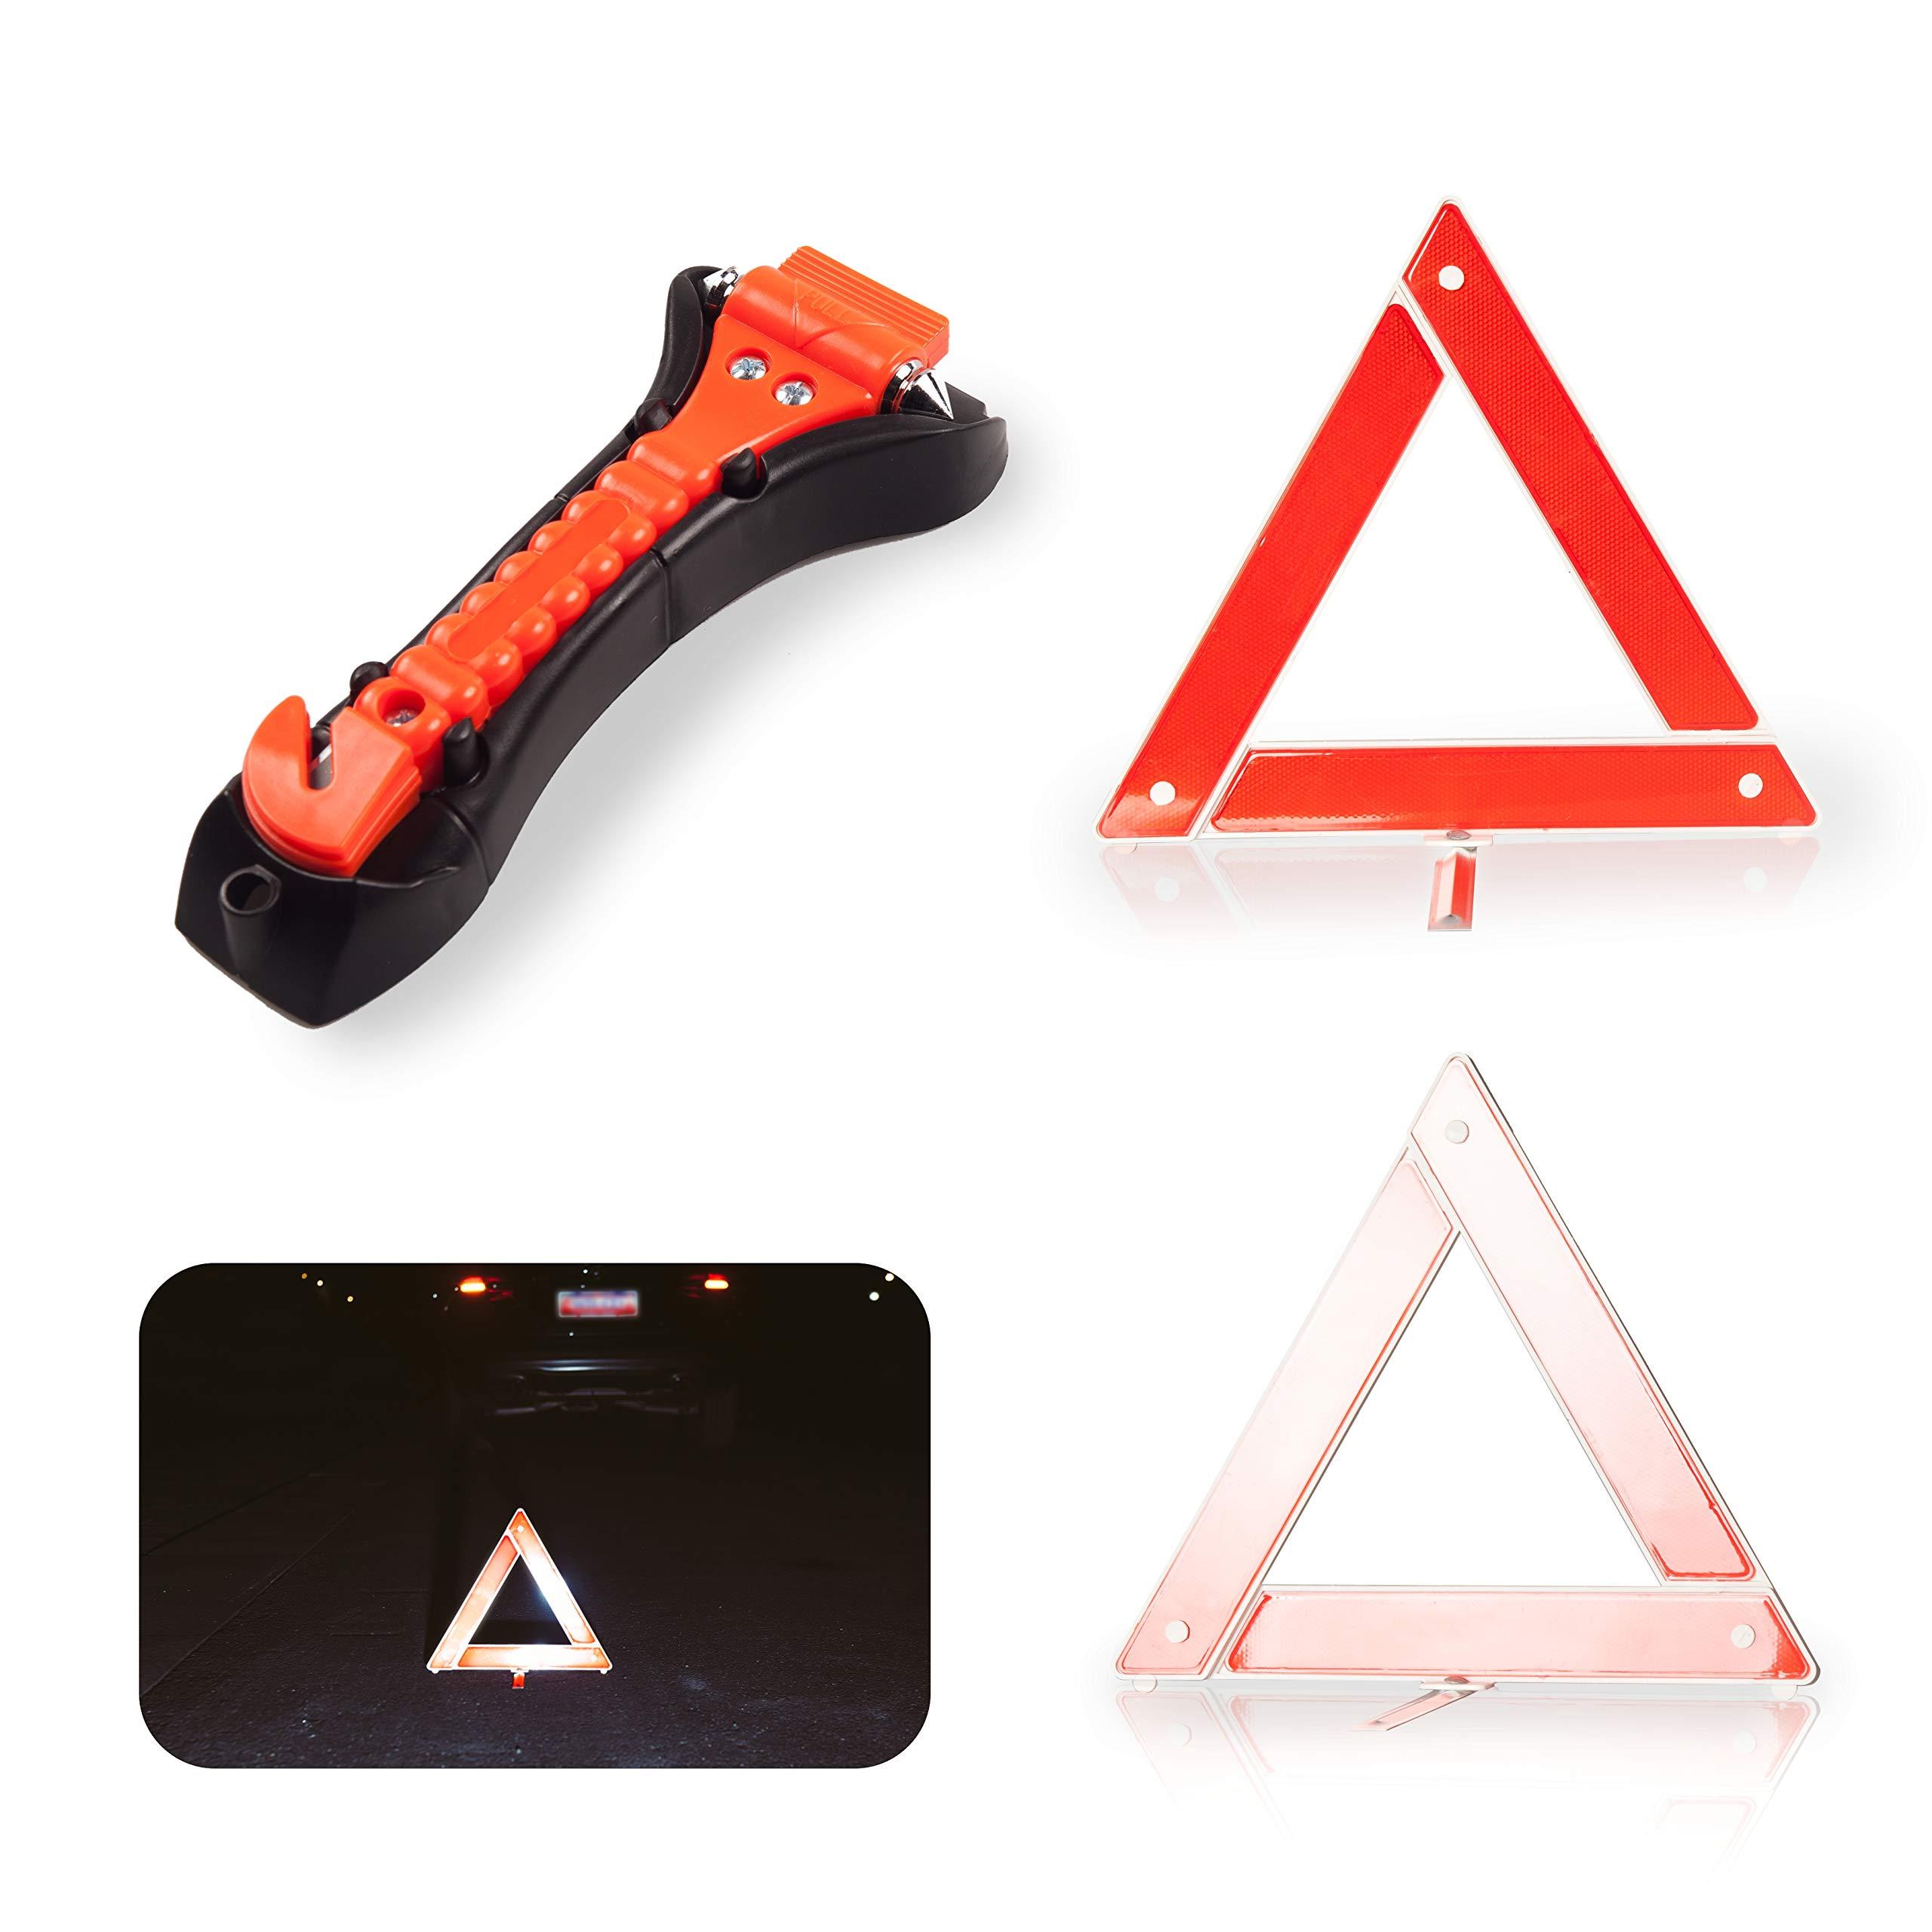 Safety Kit for Car - Warning Triangle Foldable Safety Triple Warning Kit Reflector Roadside Hazard Sign Triangle Symbol + Emergency Hammer